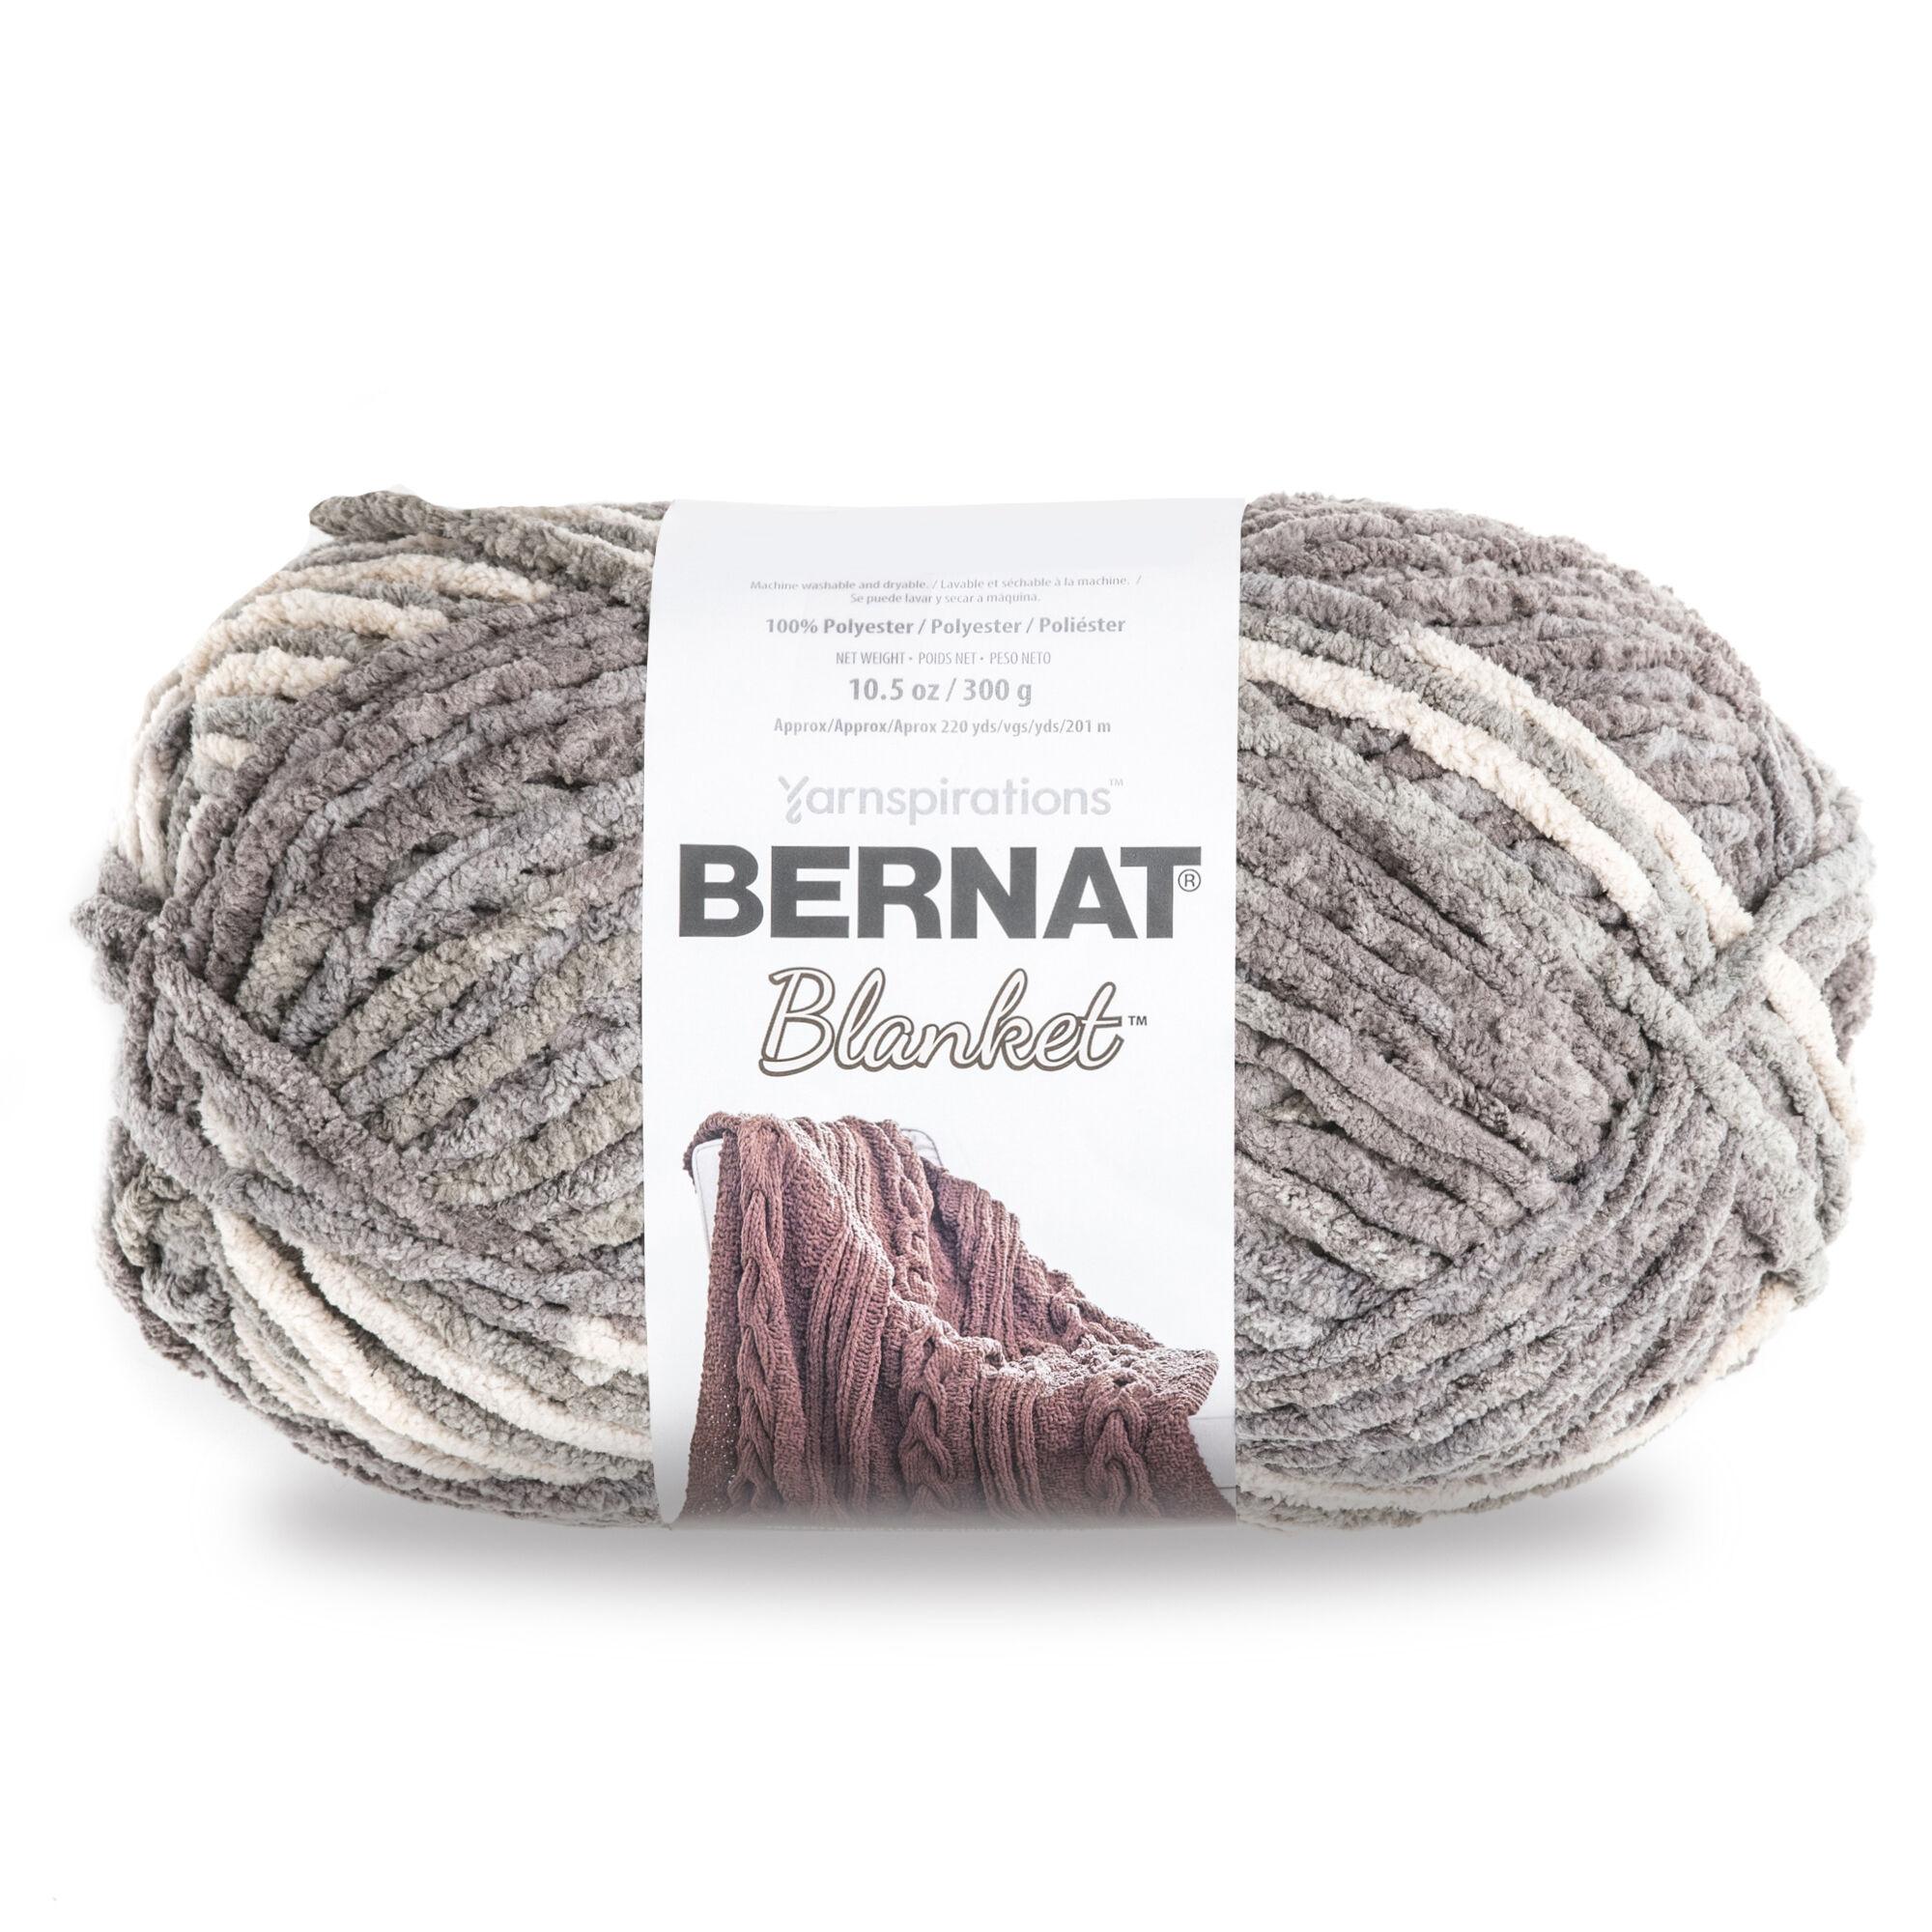 10 x 50g Sirdar Crofter Fair Isle Effect D//k Wool//Yarn For Knitting//Crochet Sh45